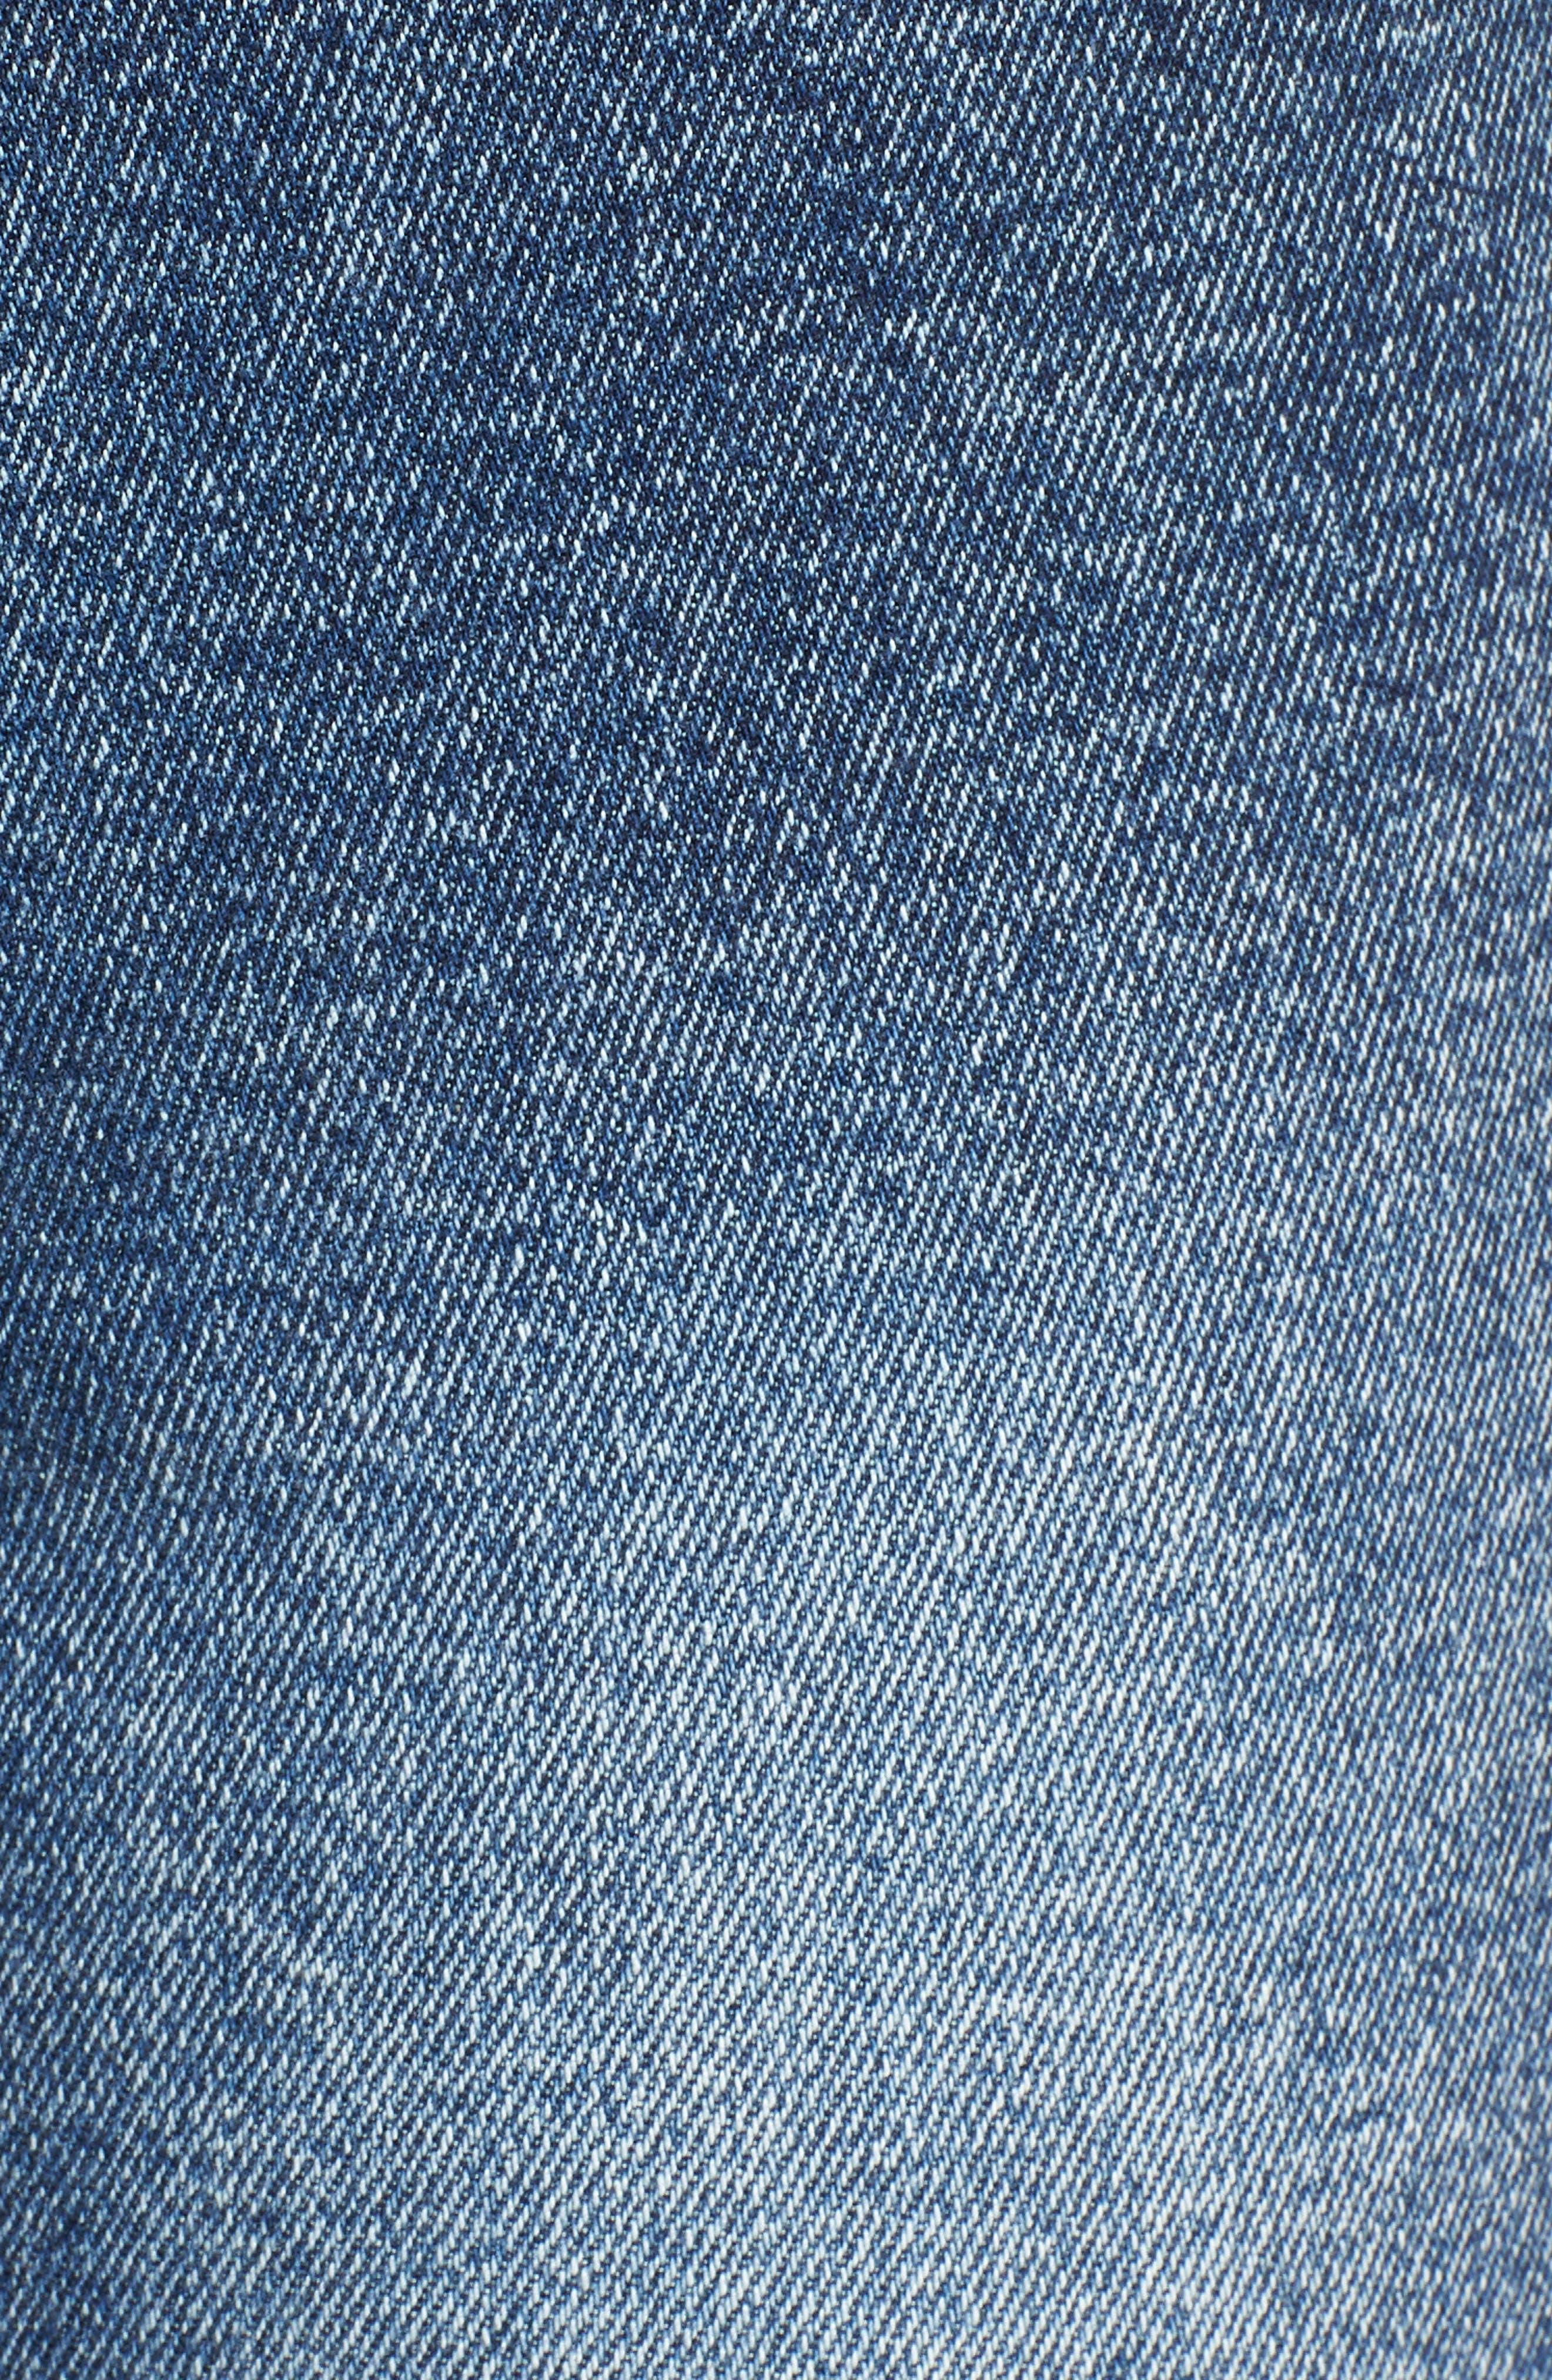 Acid Wash High Waist Crop Jeans,                             Alternate thumbnail 3, color,                             Dark Acid